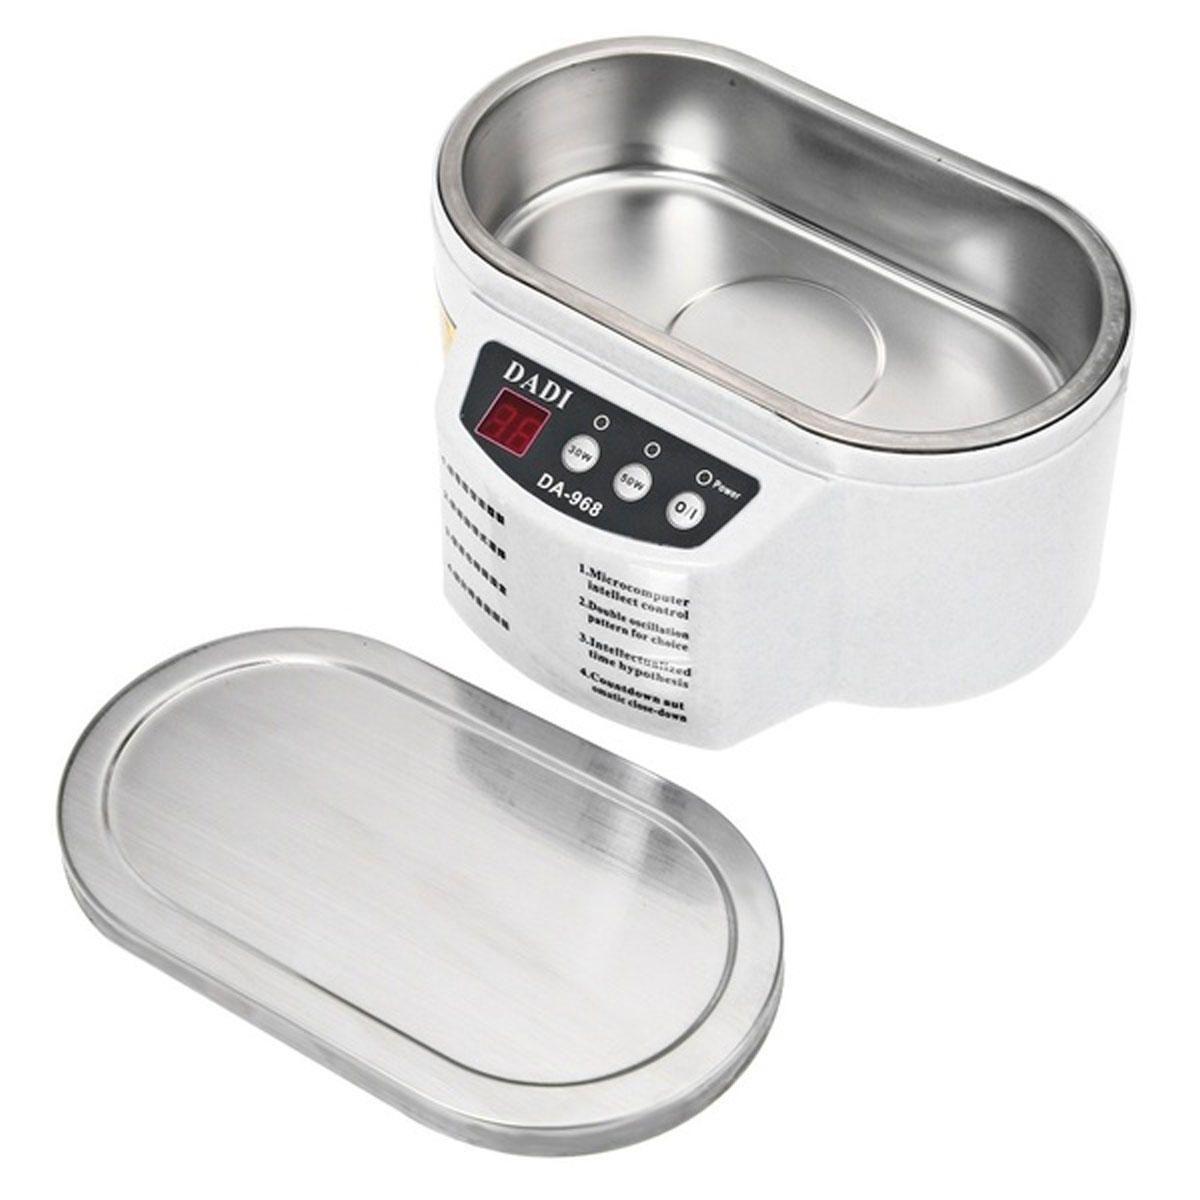 30W 50W Mini Ultrasonic Cleaner Bath For Cleaning Jewelry Glasses Circuit Board False Teeth